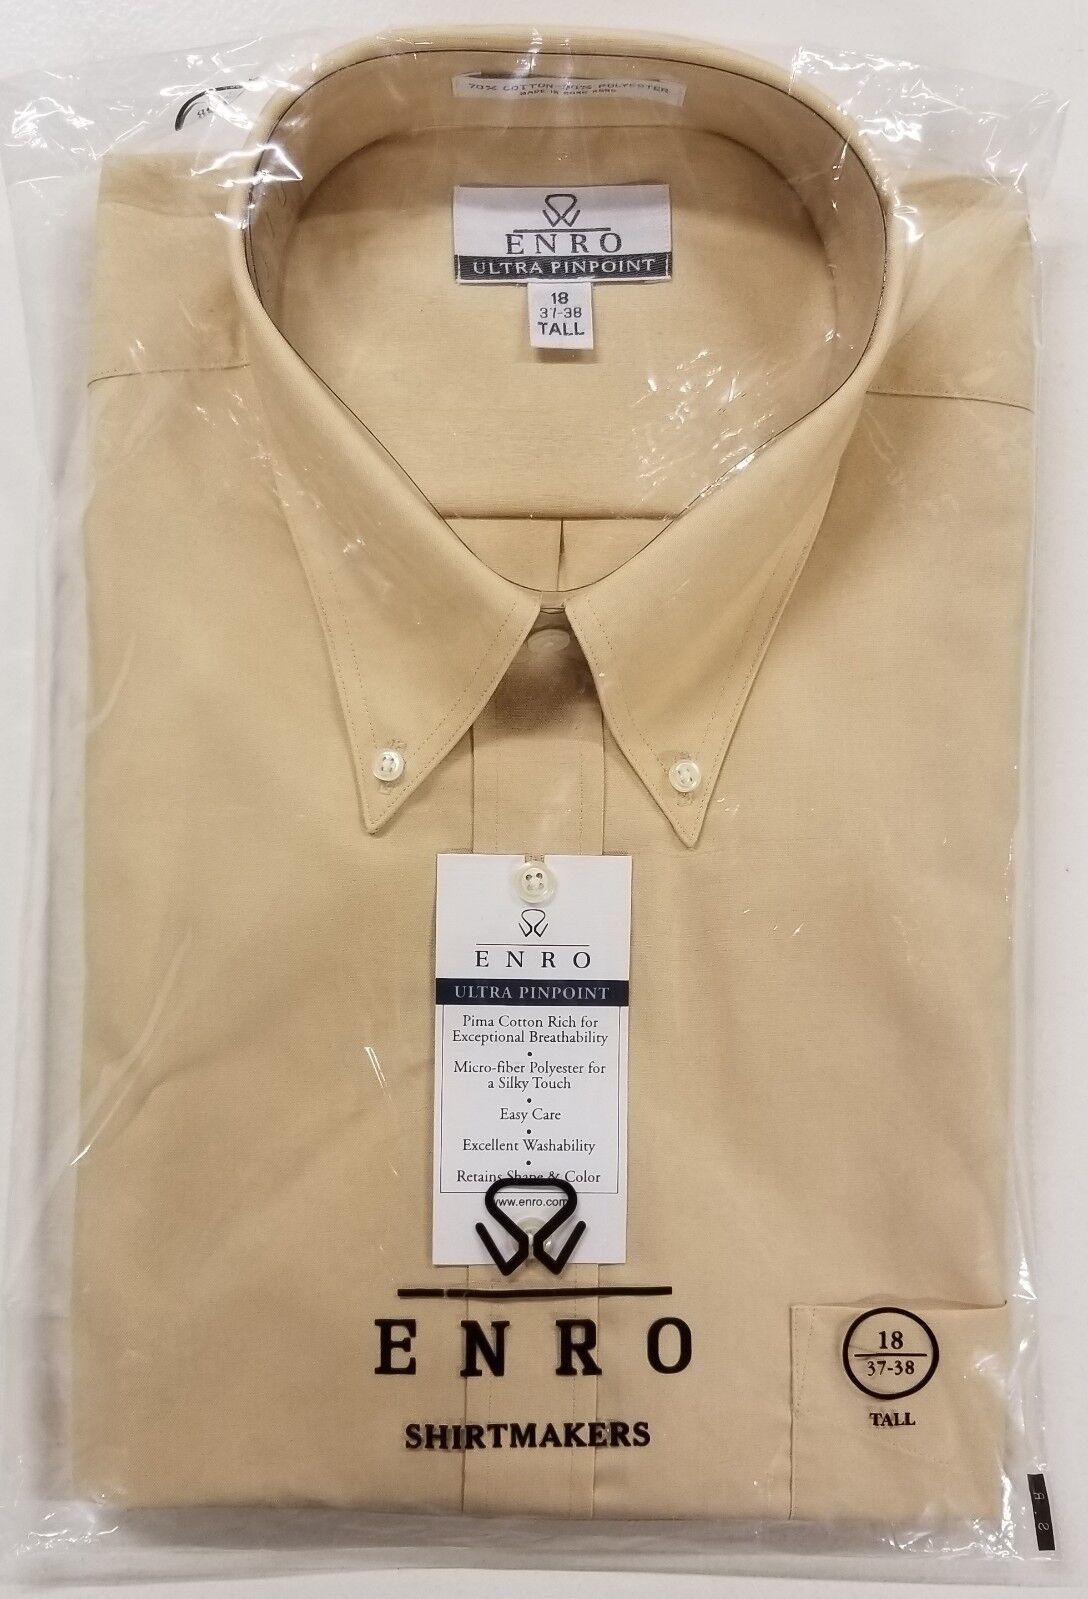 ENRO Long Sleeve Dress hemds BRAND NEW CLEARANCE BUNDLE(3)-Größe 17.5 37-38 Tall